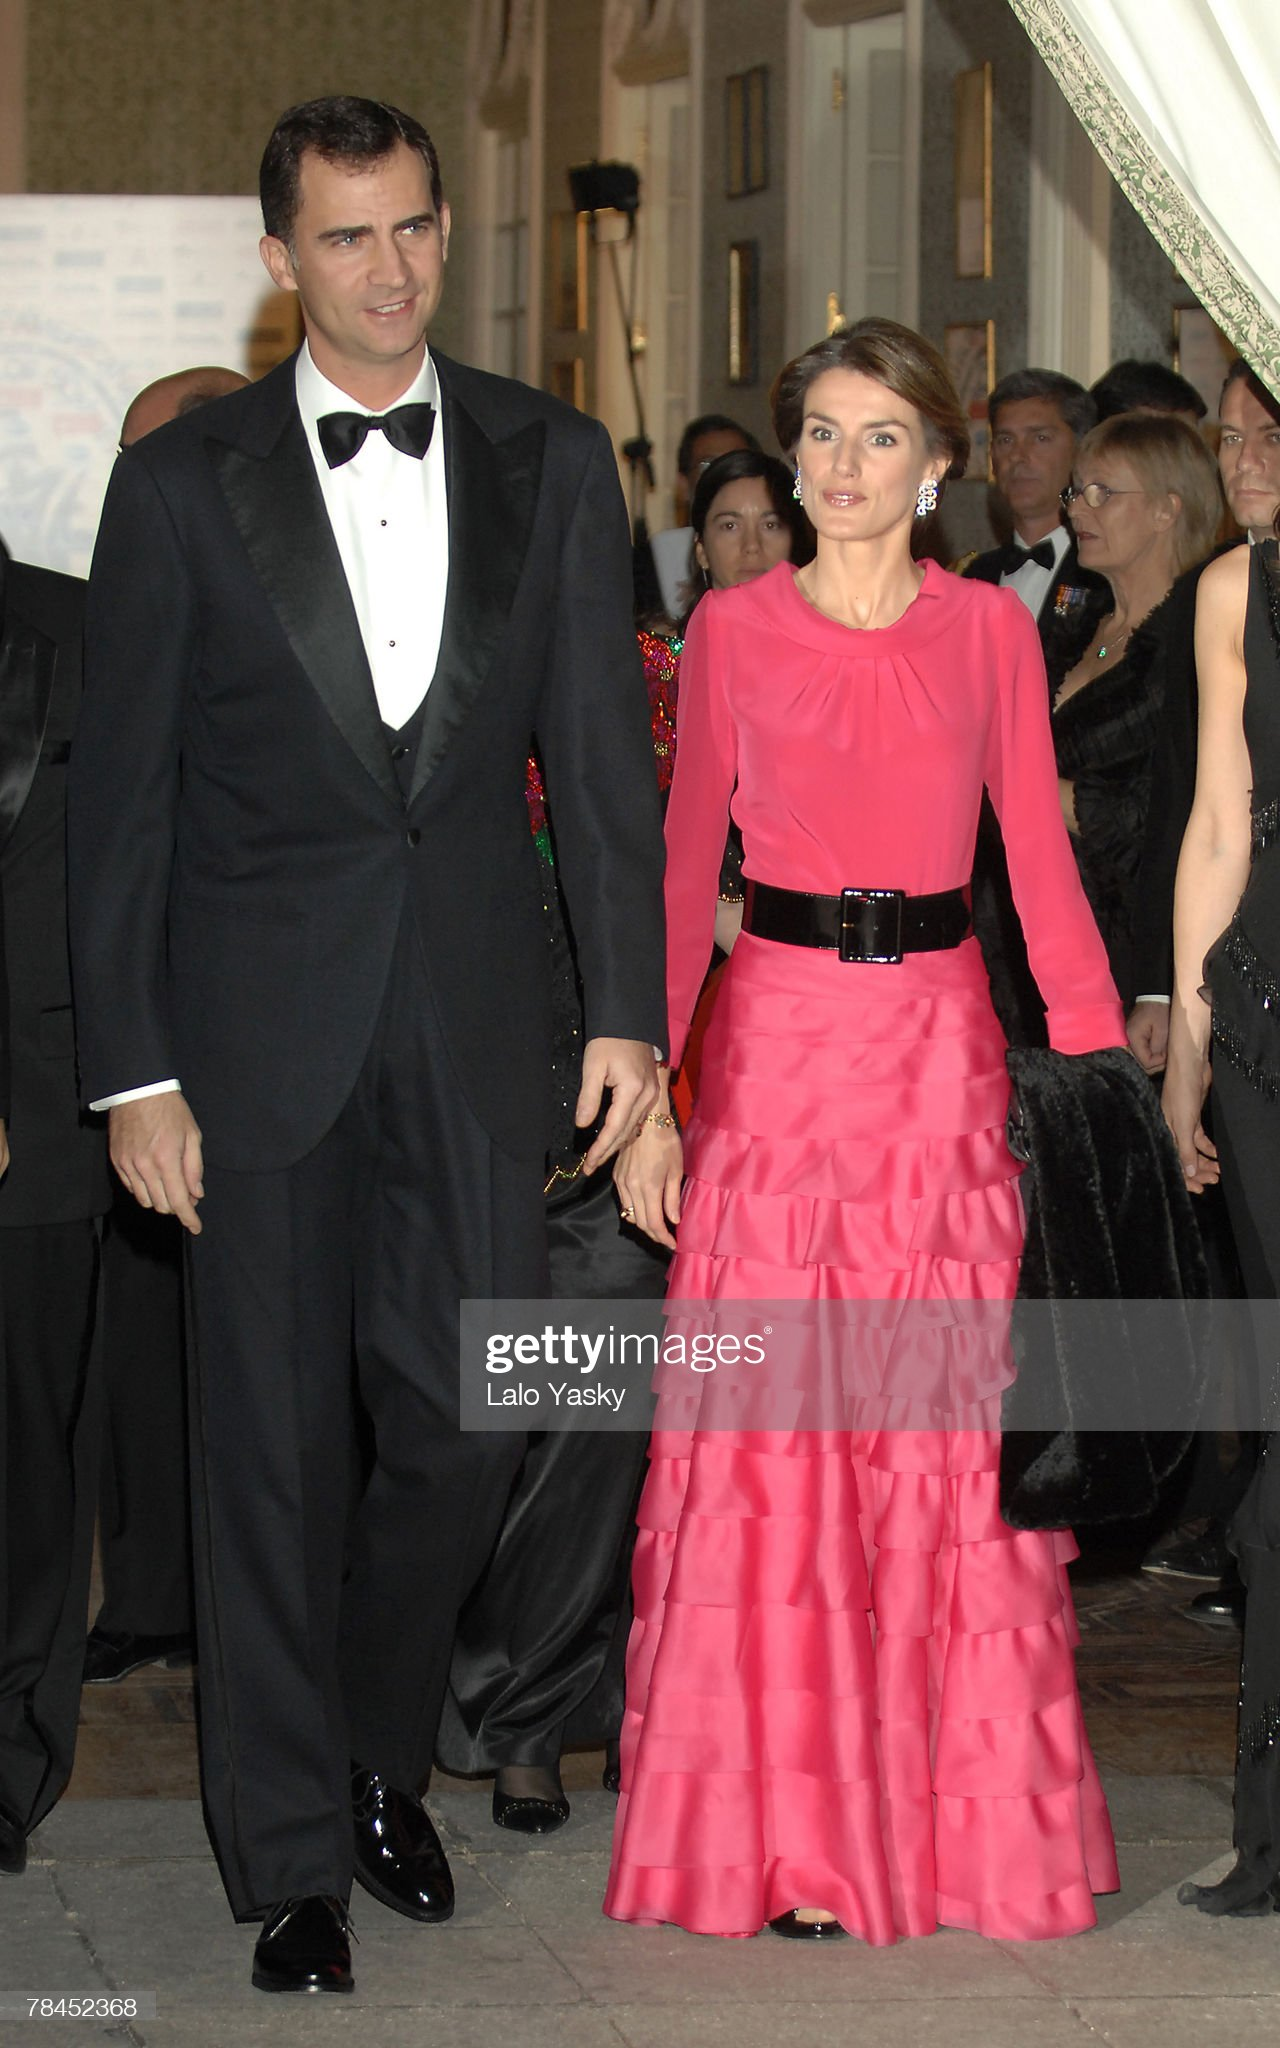 Вечерние наряды Королевы Летиции Royals attend the Gala Dinner for the American Commerce Chamber : News Photo